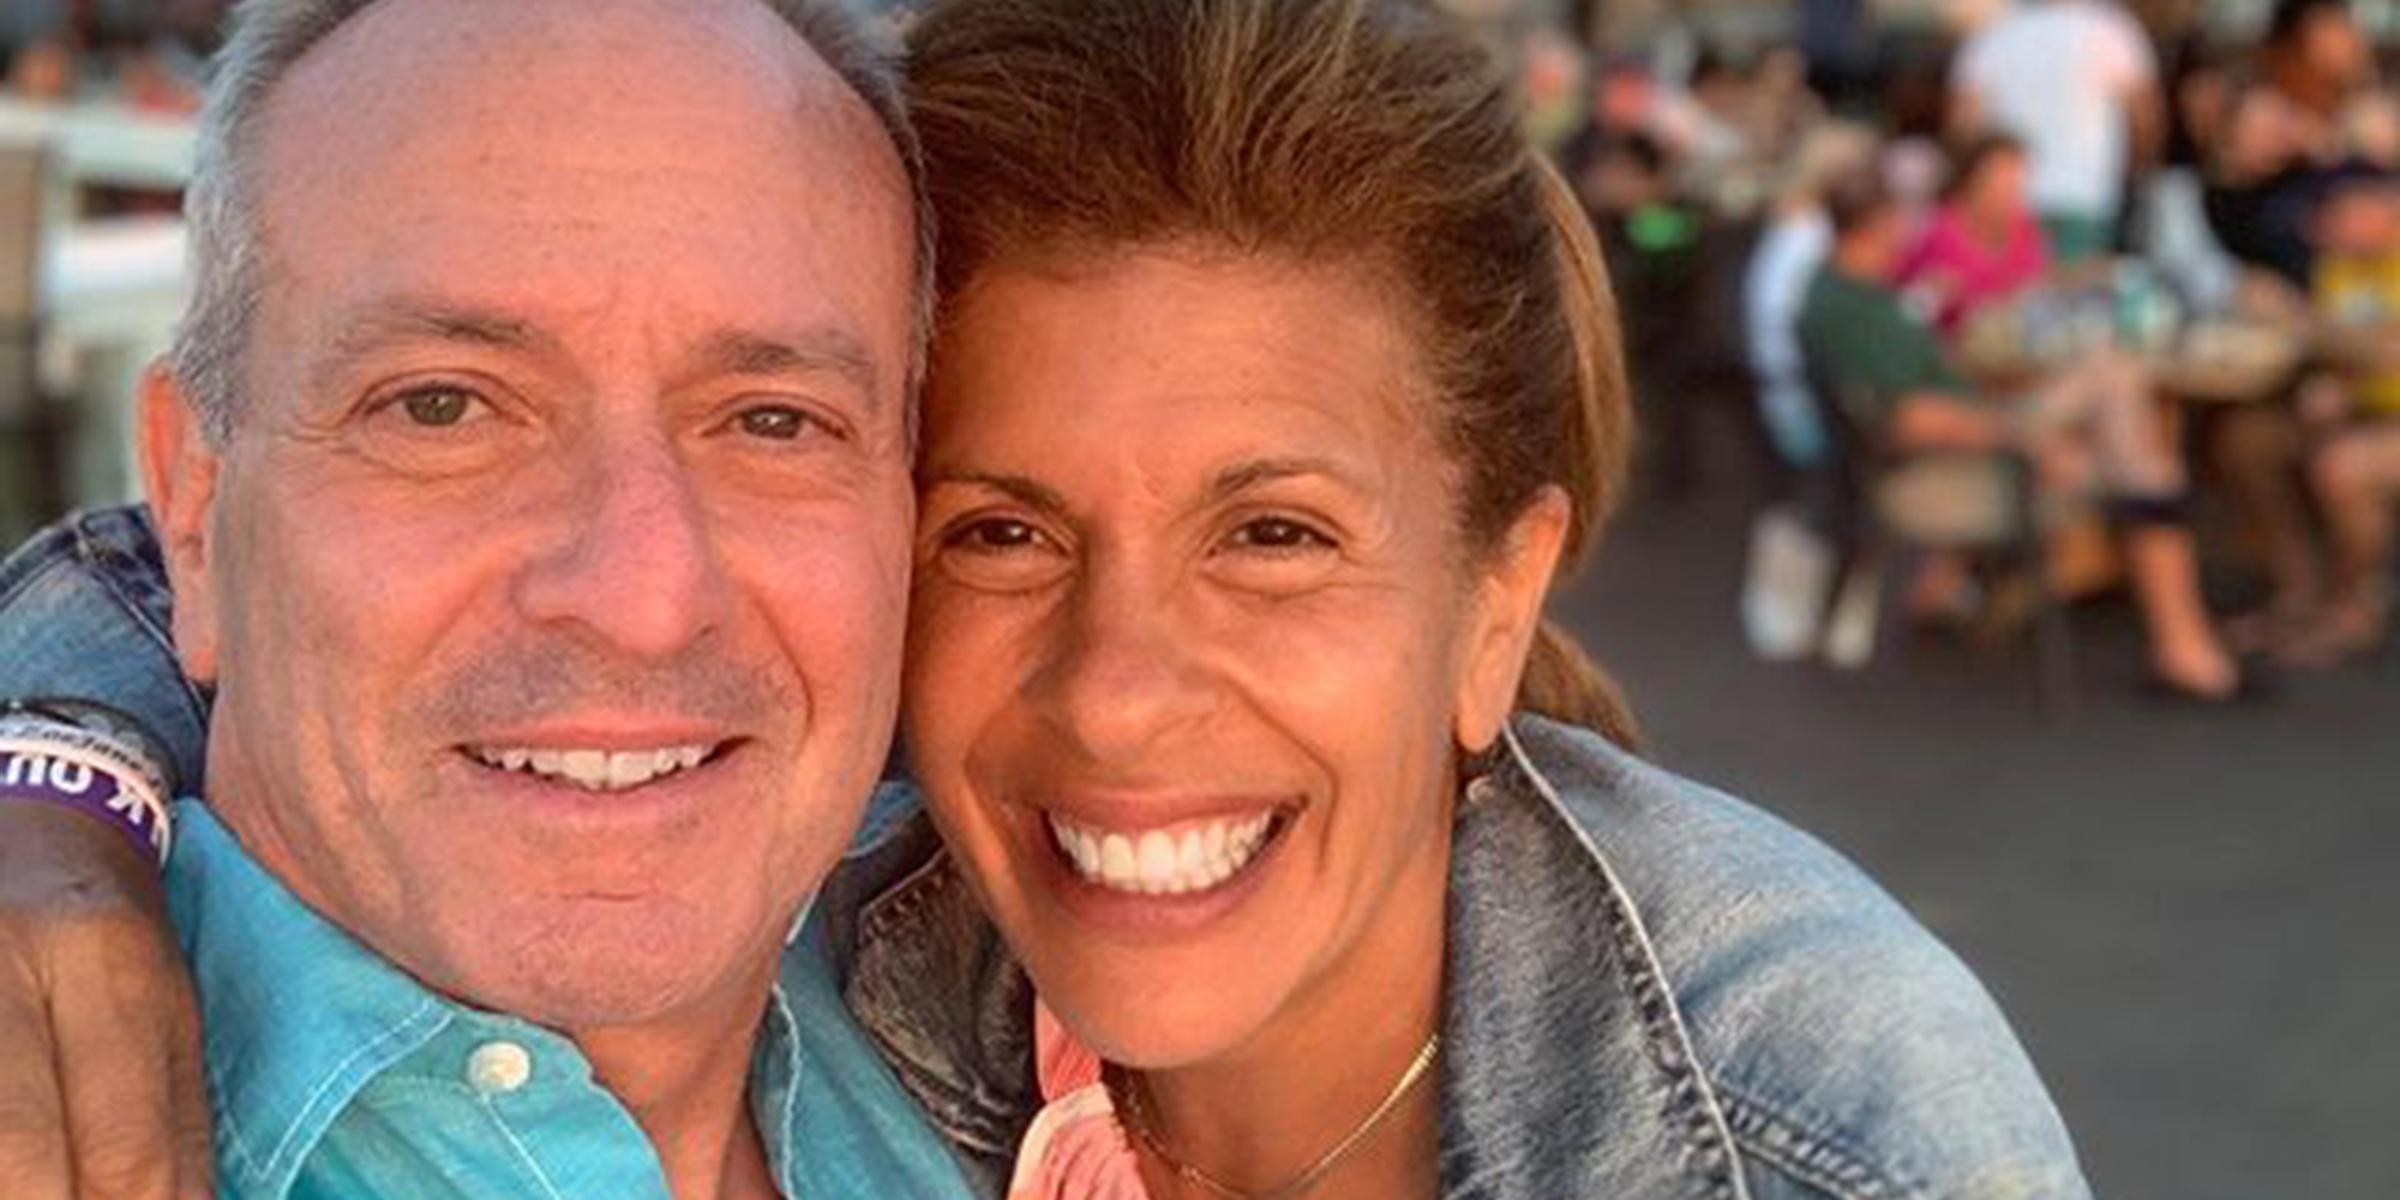 Hoda Kotb recalls touching moment when Joel Schiffman said 'I love you'